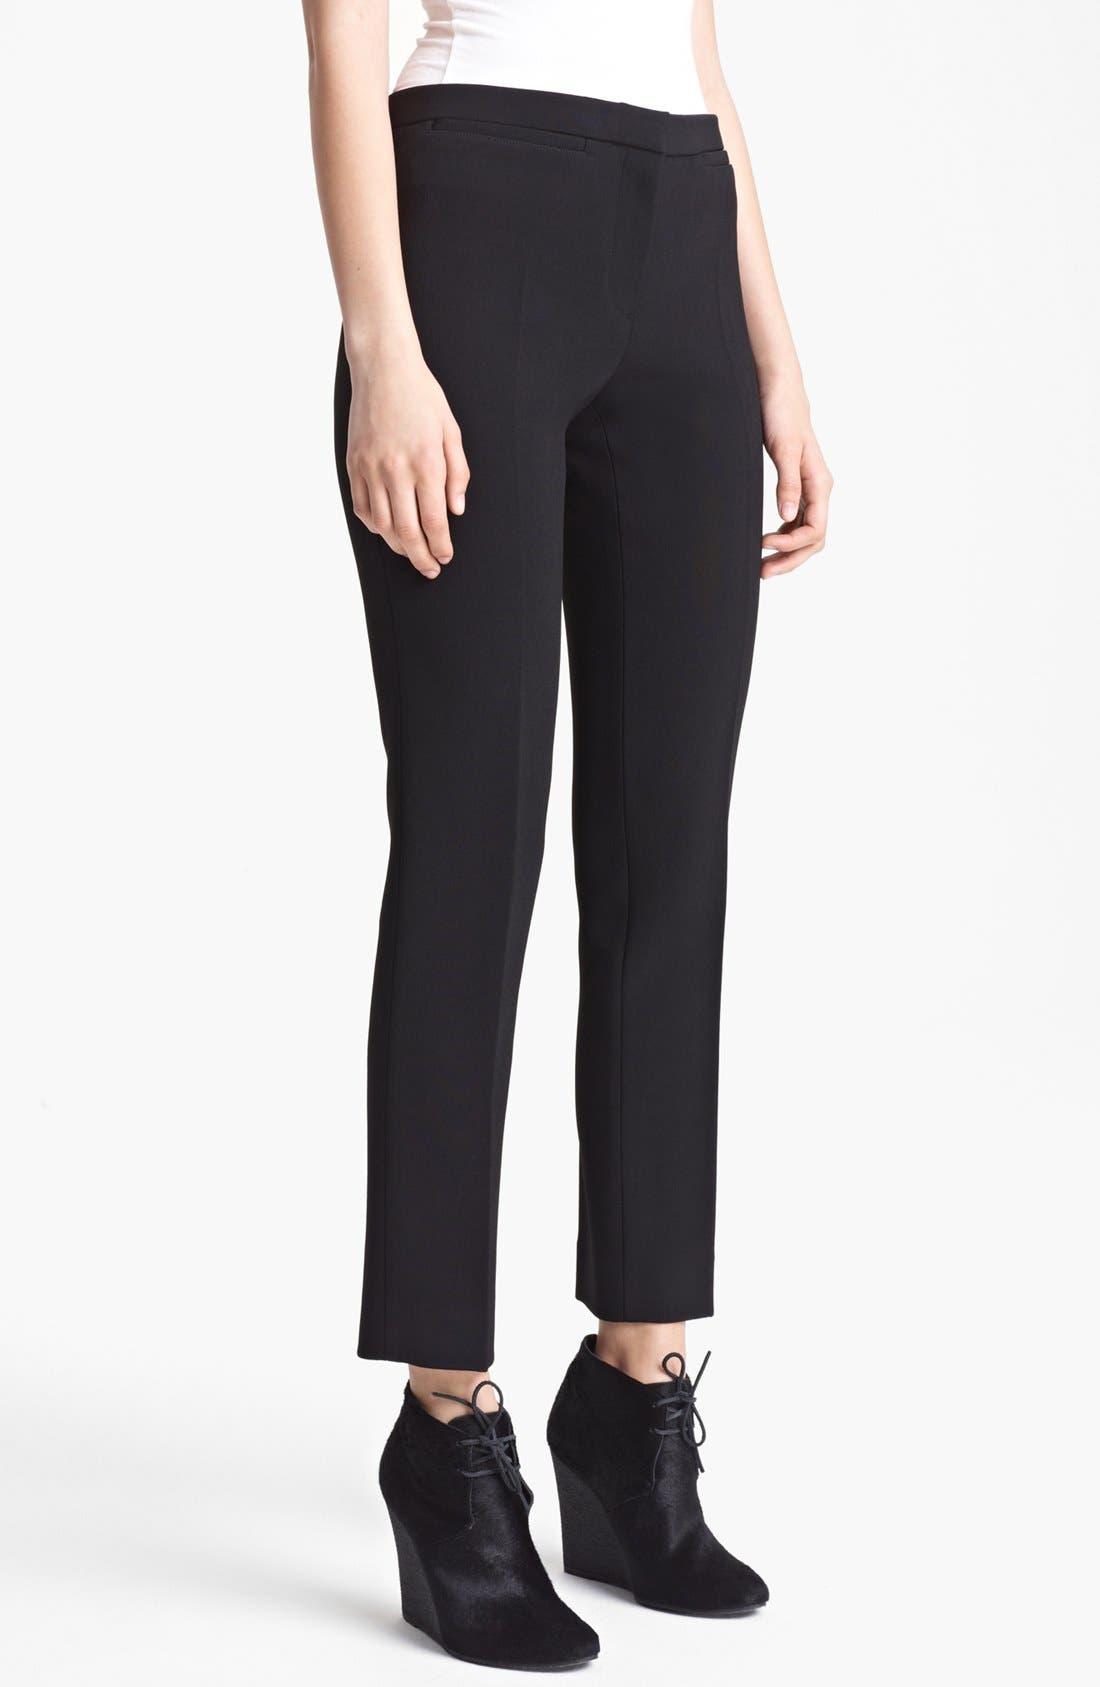 Alternate Image 1 Selected - Burberry Prorsum Narrow Leg Stretch Crepe Pants